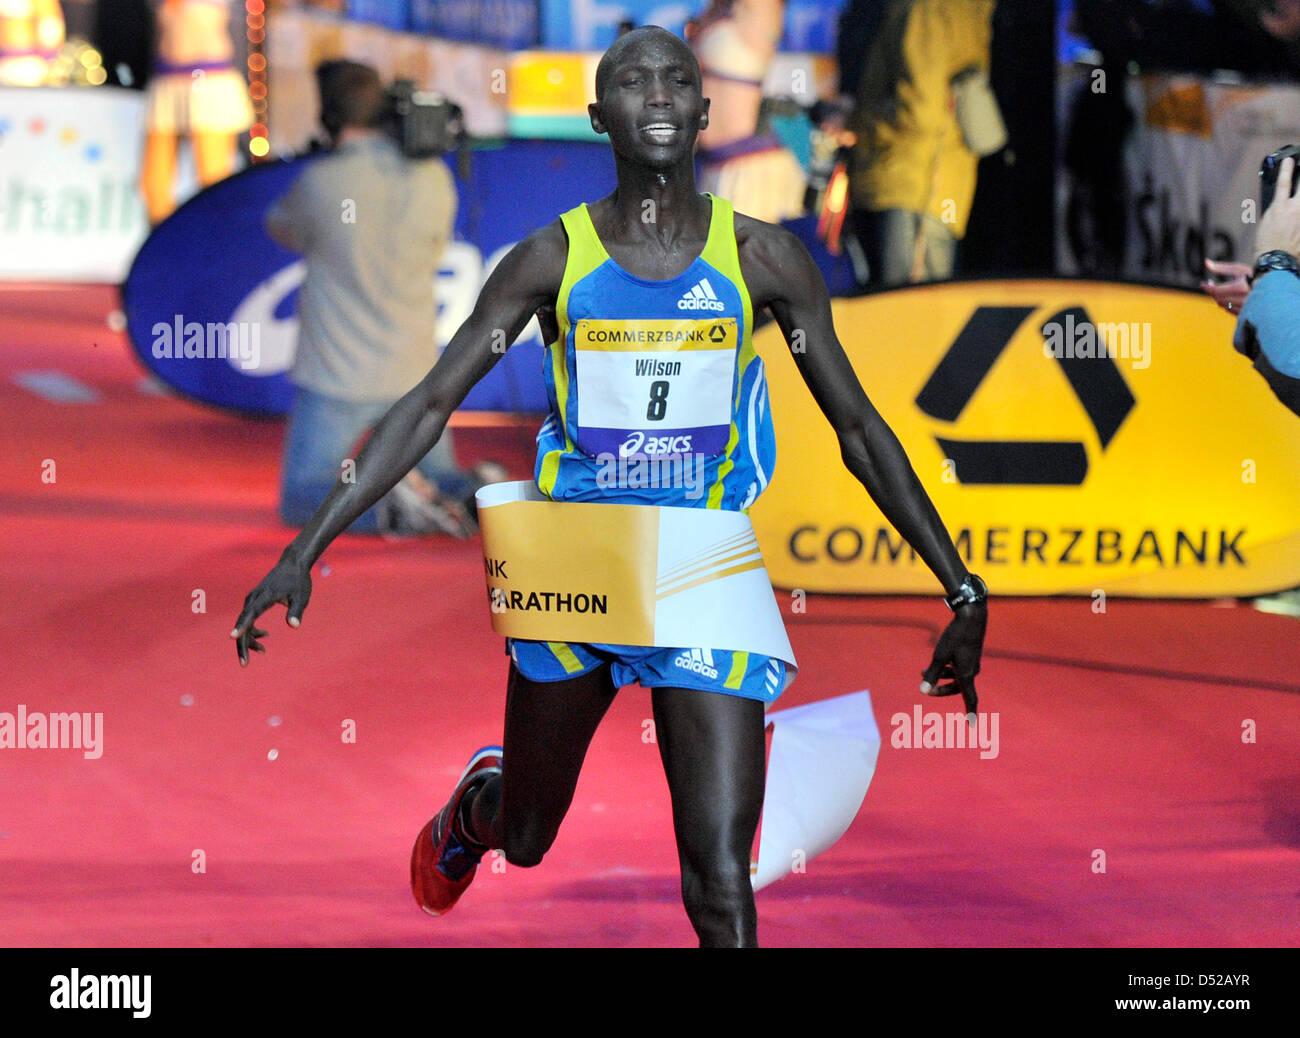 Kenyan athlete Wilson Kipsang wins the 29th Frankfurt Marathon, Germany, 31 October 2010. According to the organisers, - Stock Image